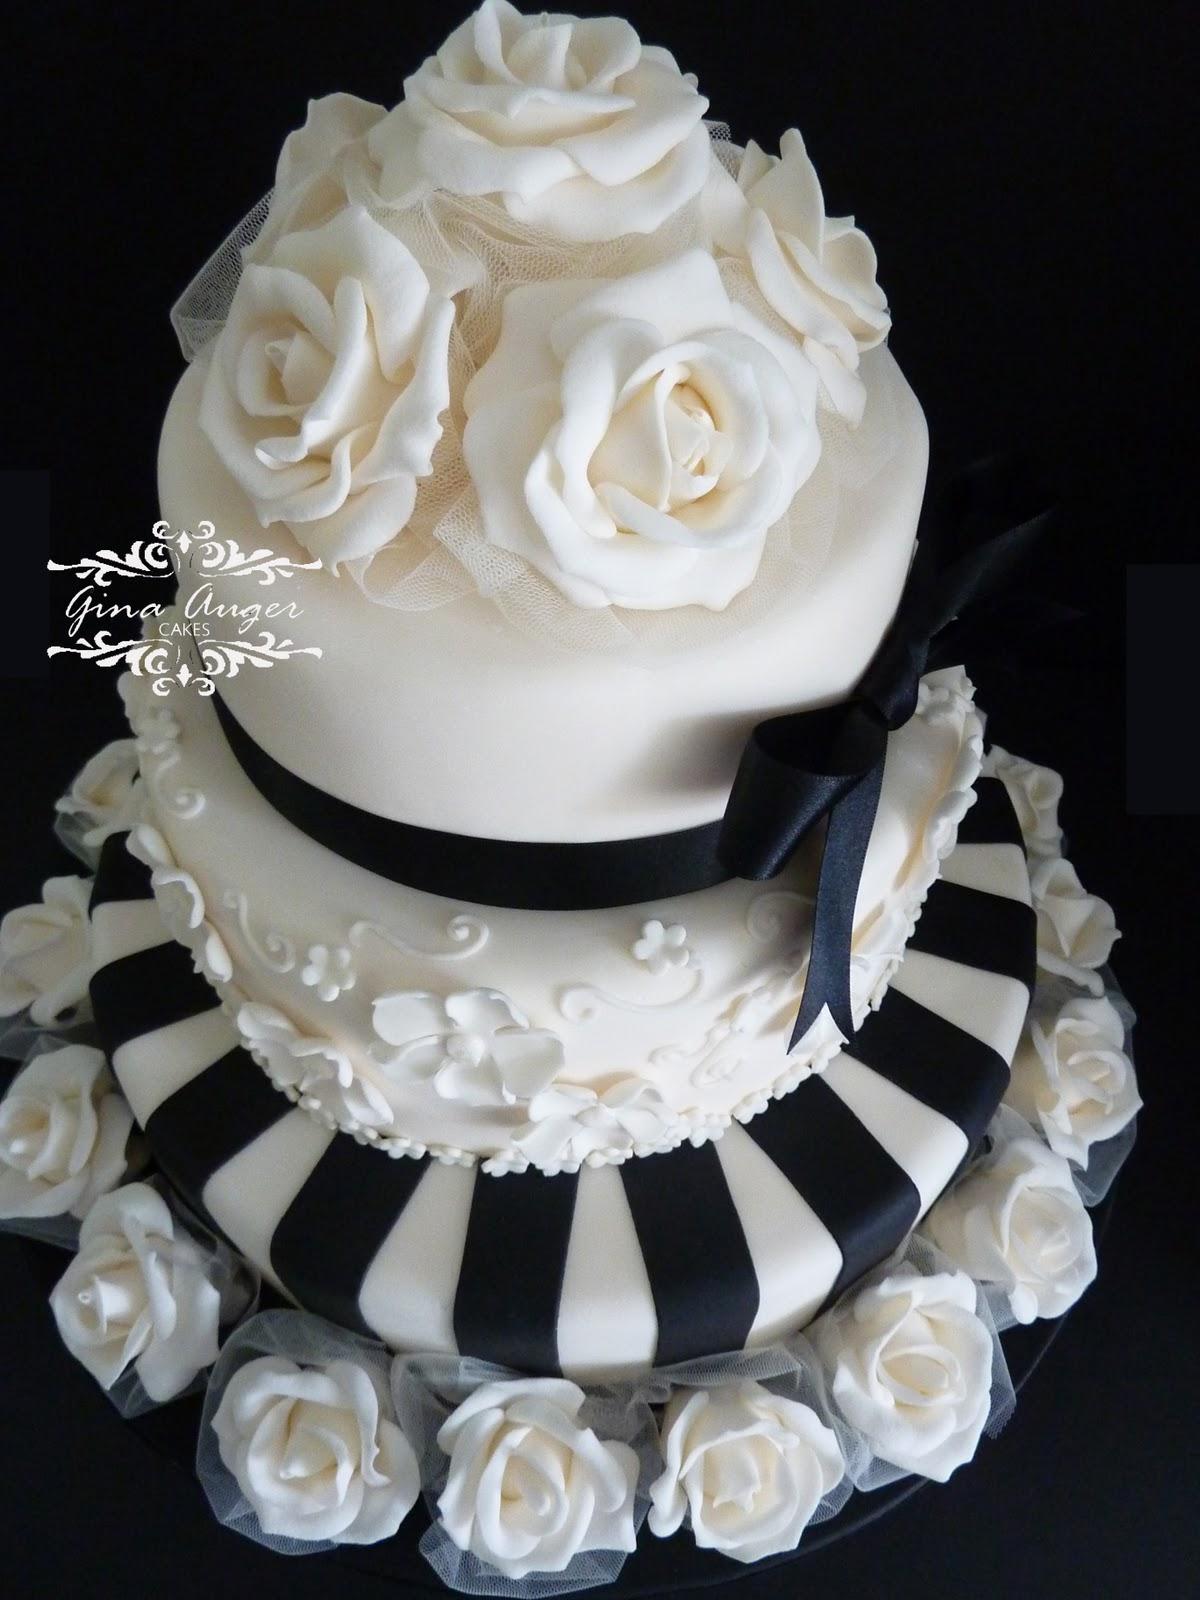 Black Fondant Wedding Cake Viewing Gallery